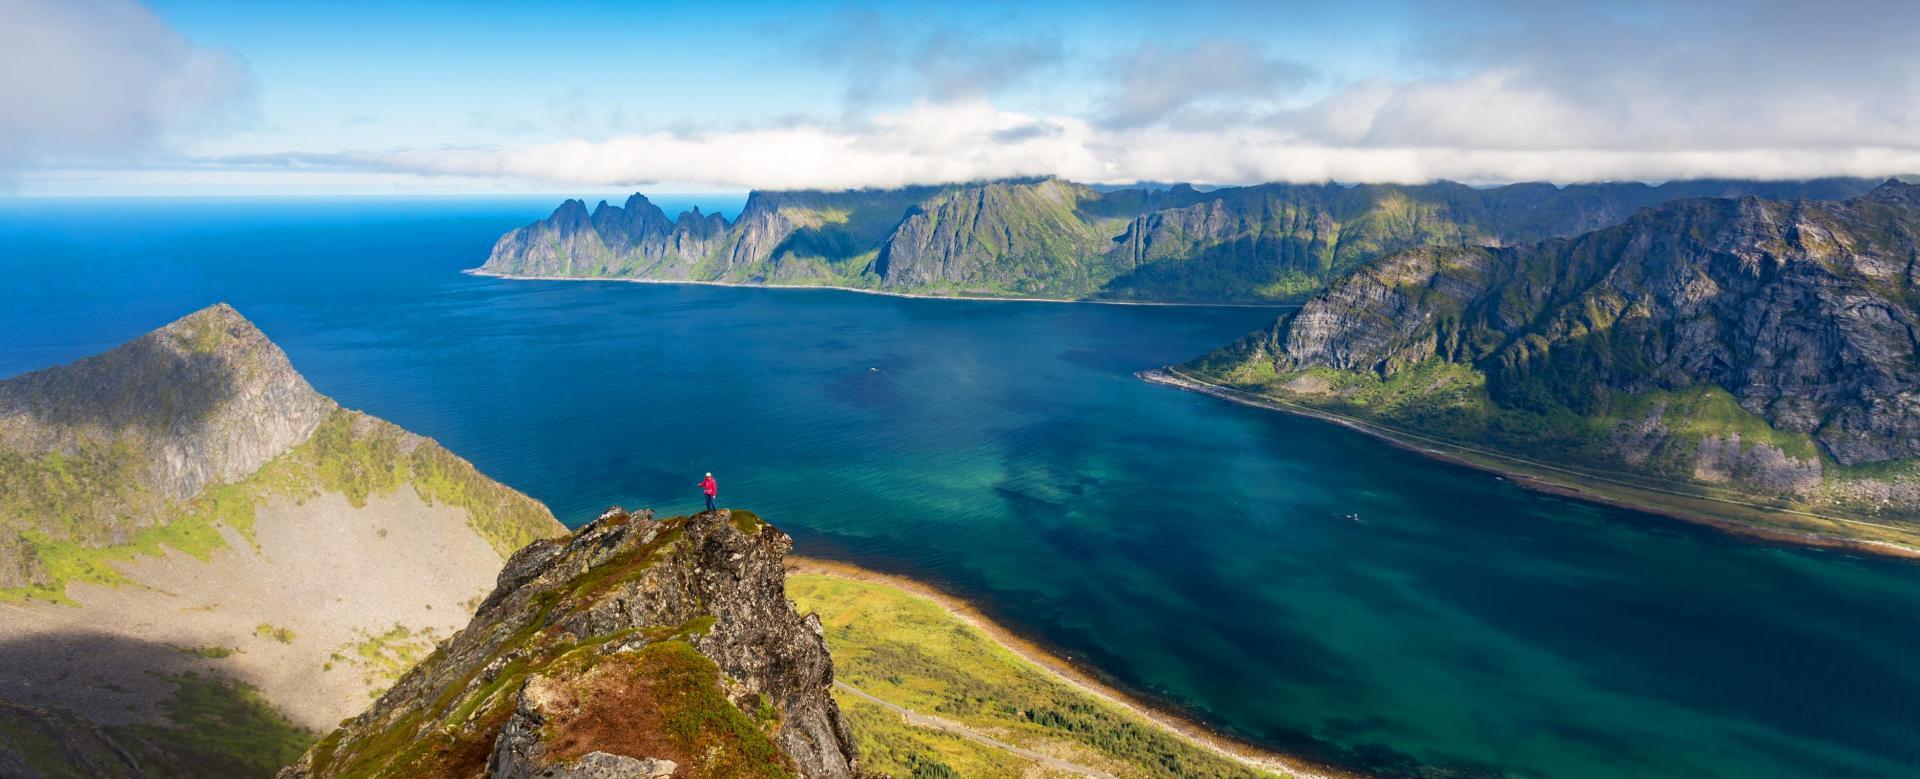 Voyage à pied Norvège : Trek sur senja, kvaløya et alpes de lyngen